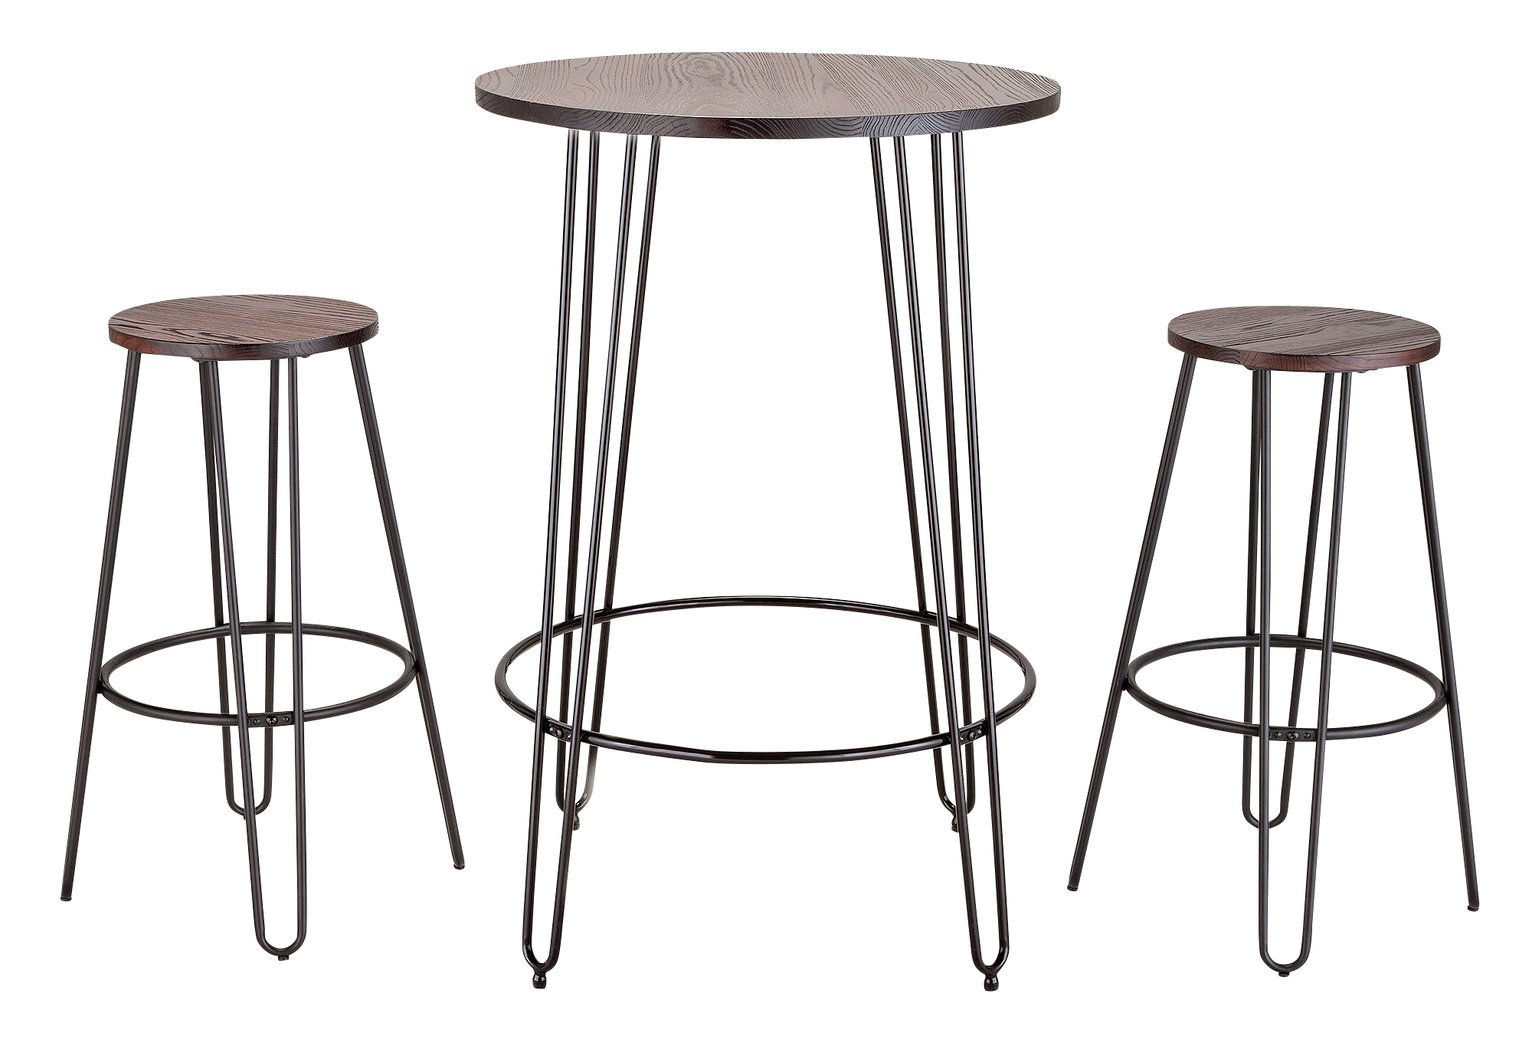 Argos Home Hairpin Bar Table & 2 Stools